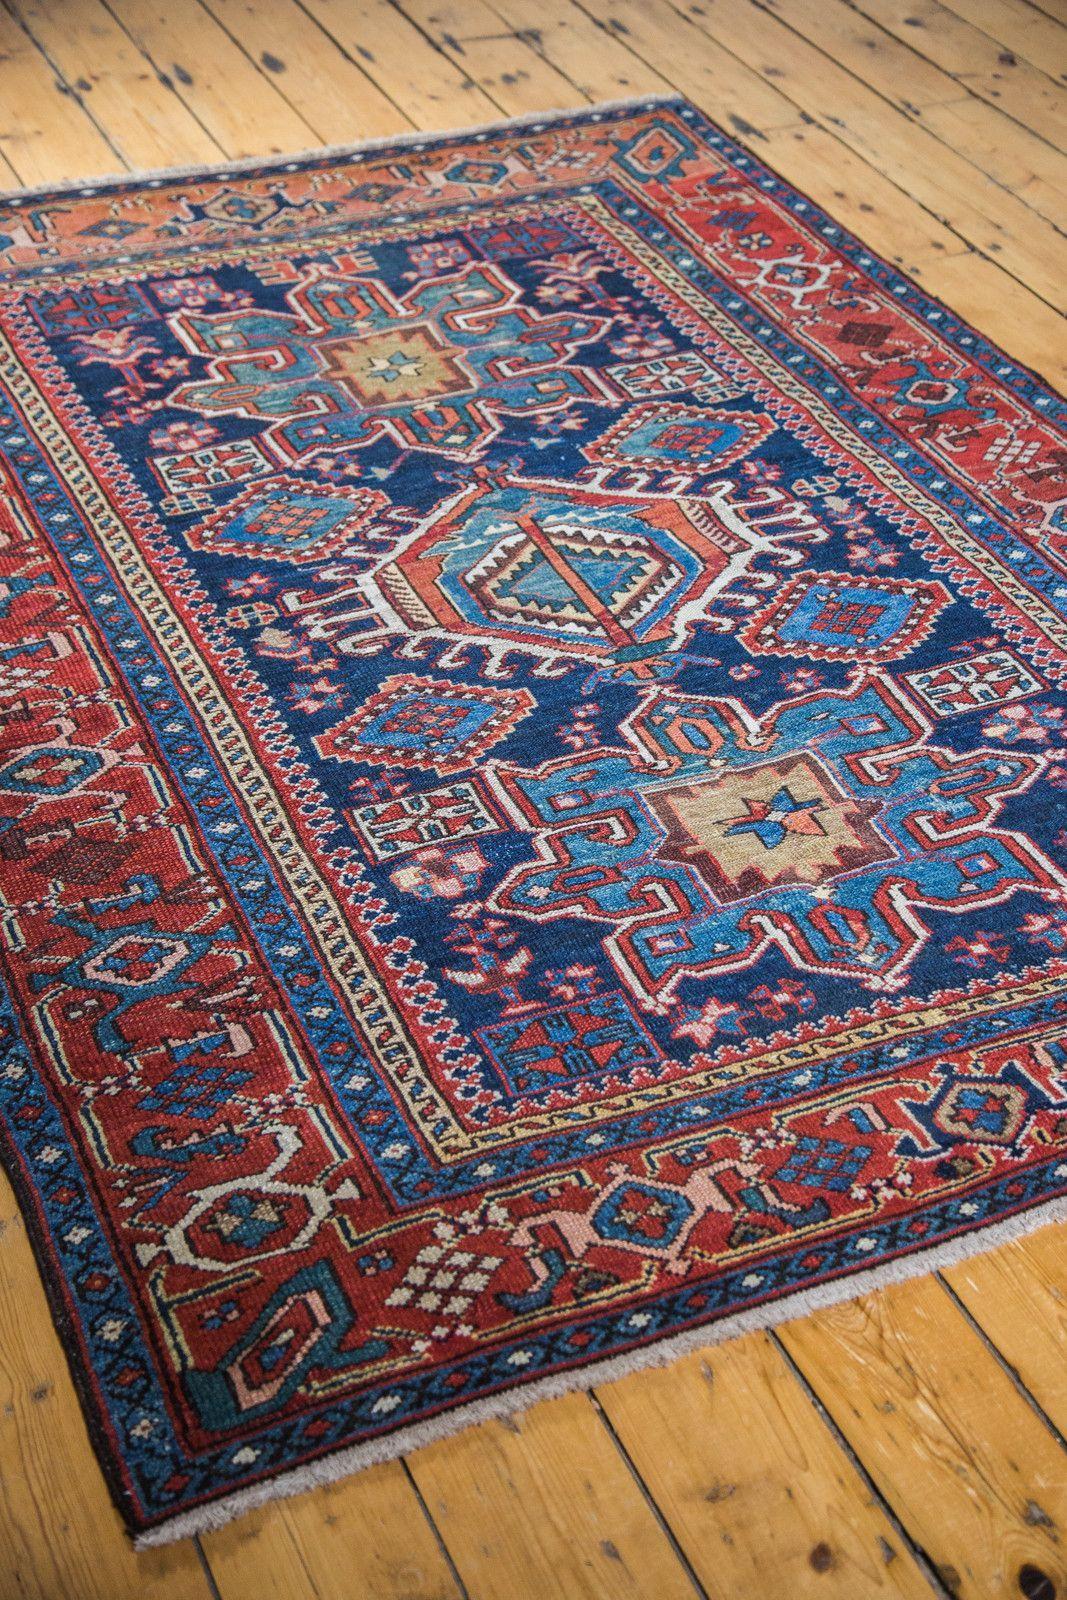 5x6 Antique Karaja Square Rug Rugs Square Rugs Carpet Handmade